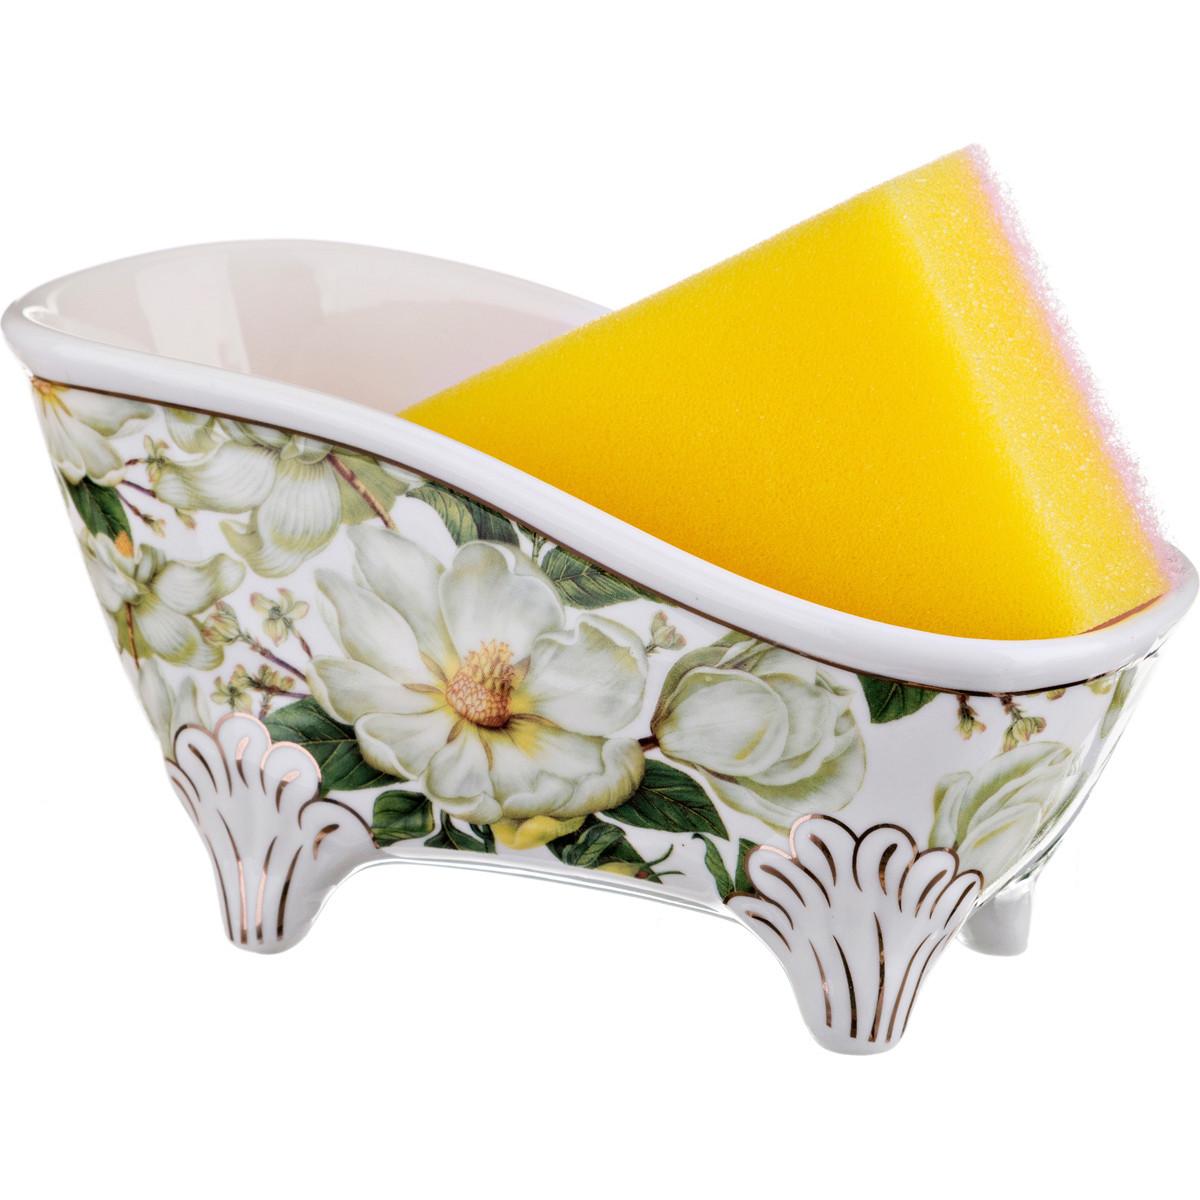 {} Lefard Набор для ванной и кухни Caravaggio (7х8х16 см) félix witting caravaggio